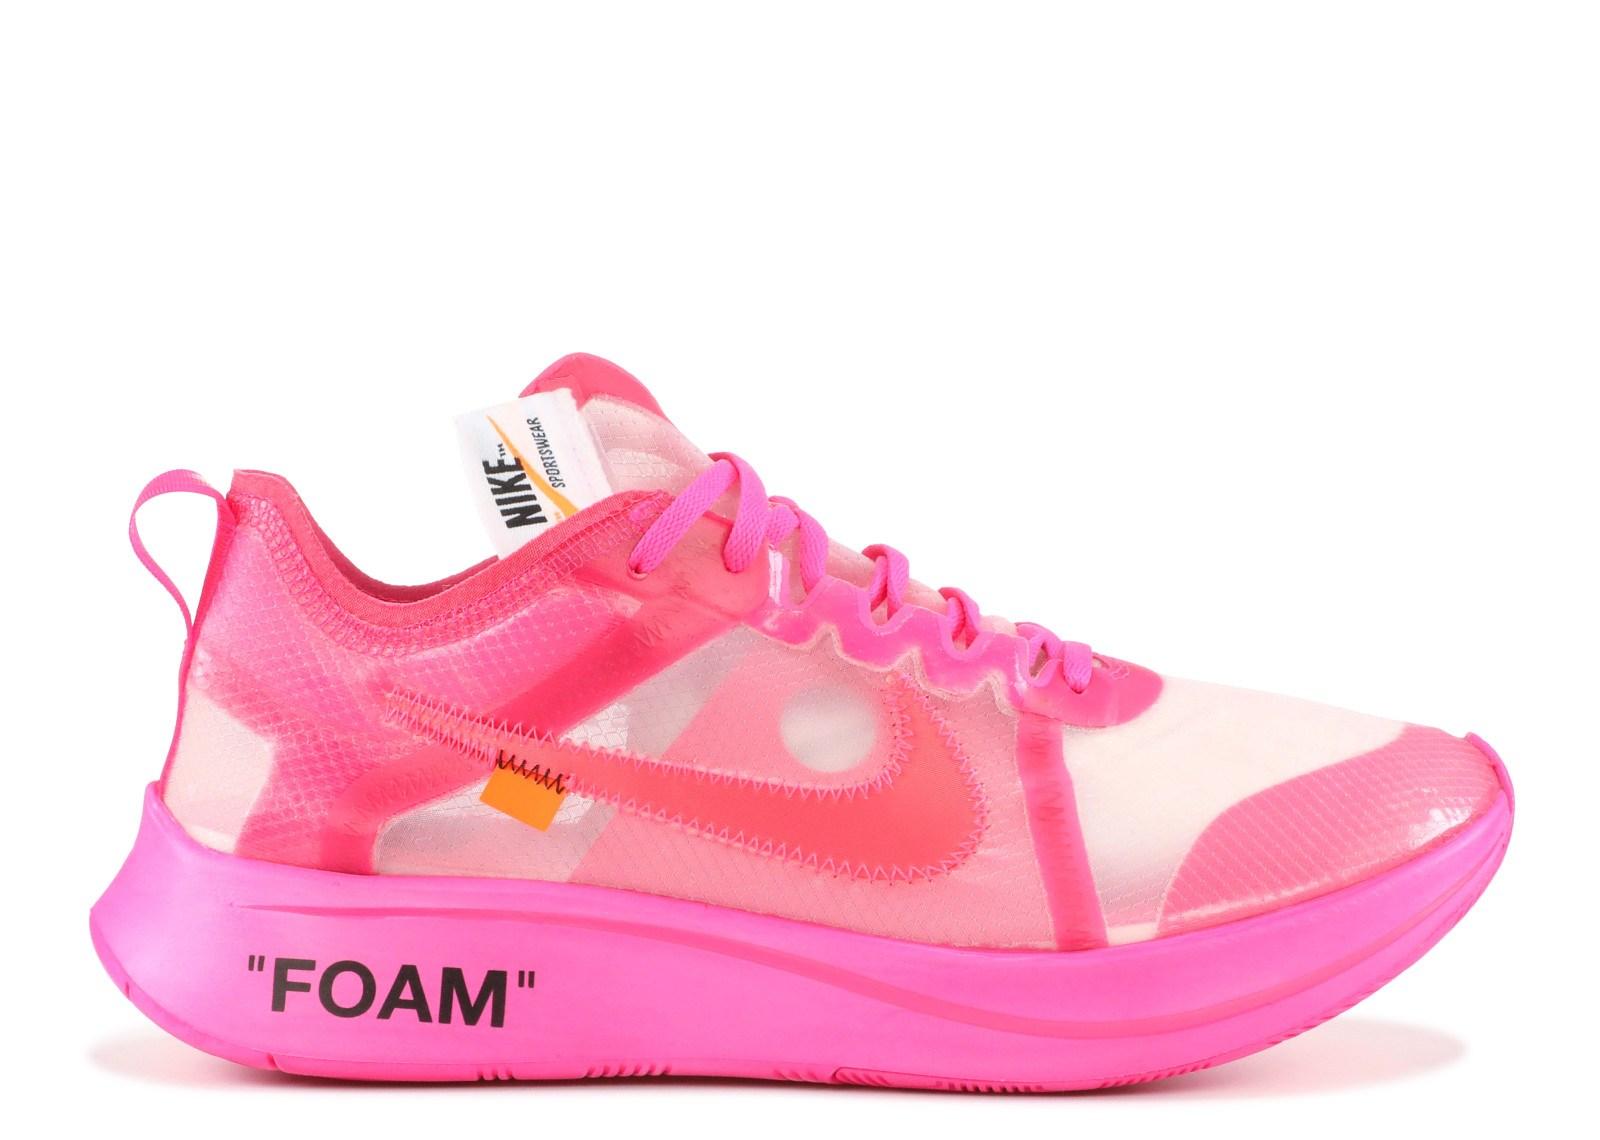 size 40 2b52c debfe Nike x Off-White. Все пары - Статьи блога интернет магазина Sneakerhead